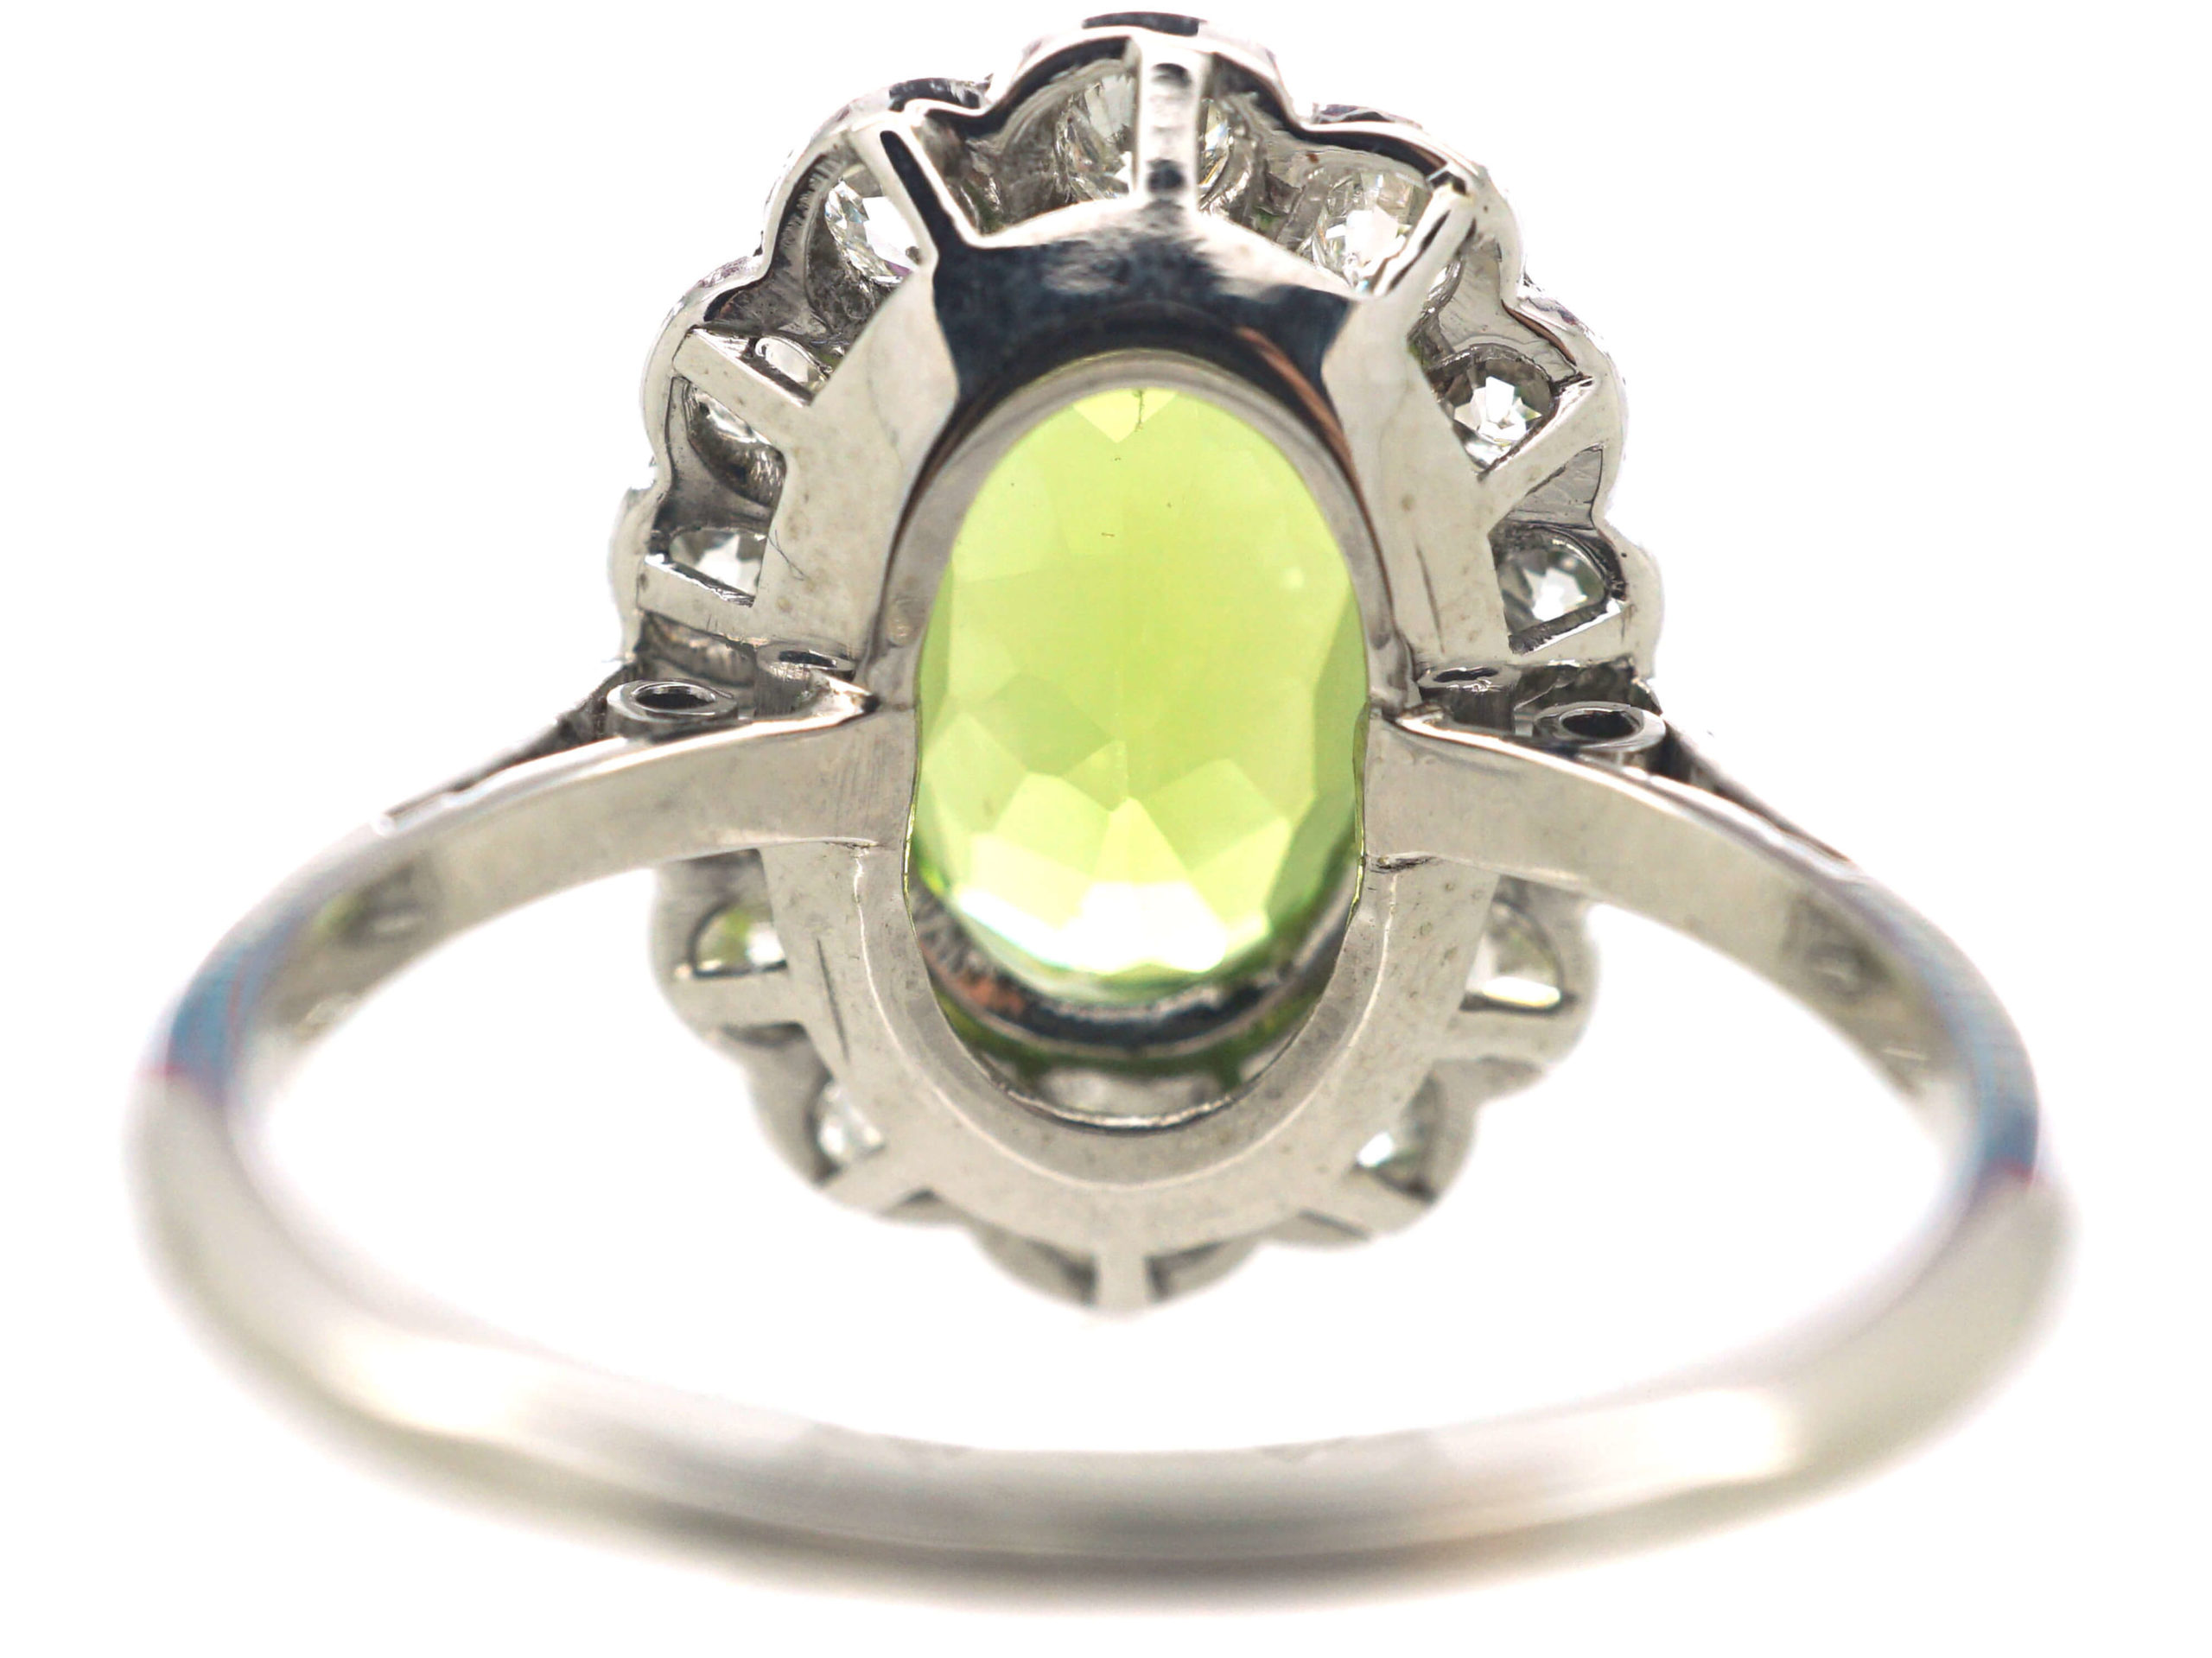 Edwardian 18ct White Gold, Diamond & Peridot Oval Cluster Ring